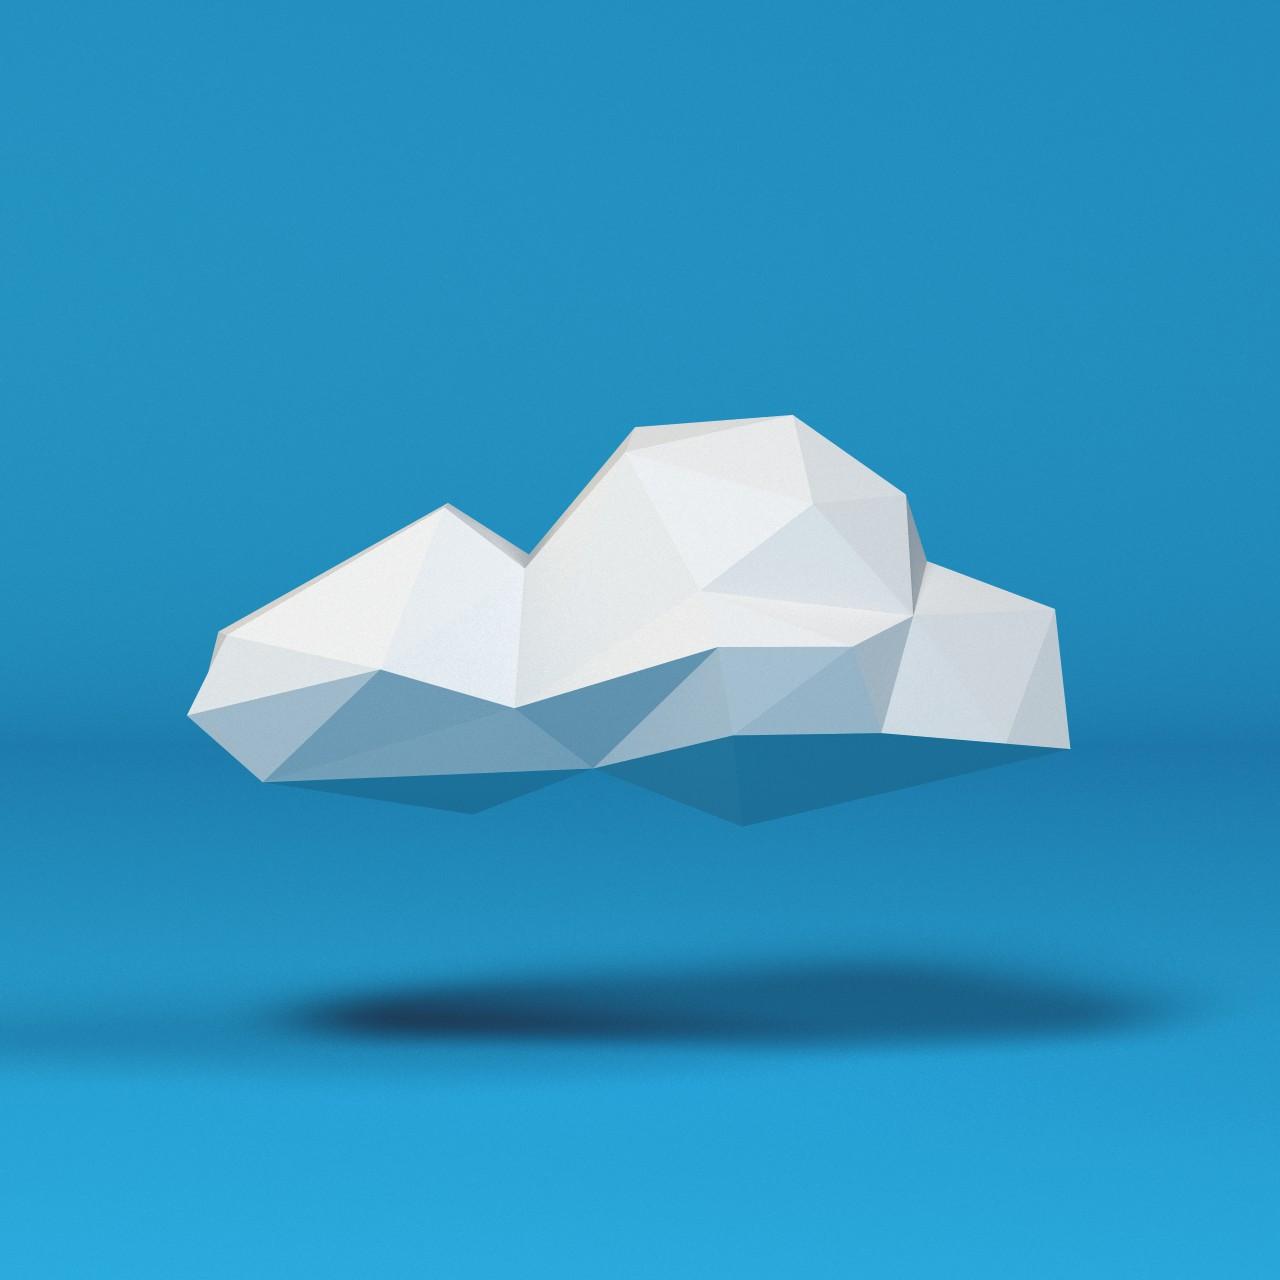 poly_cloud_1_1.jpg